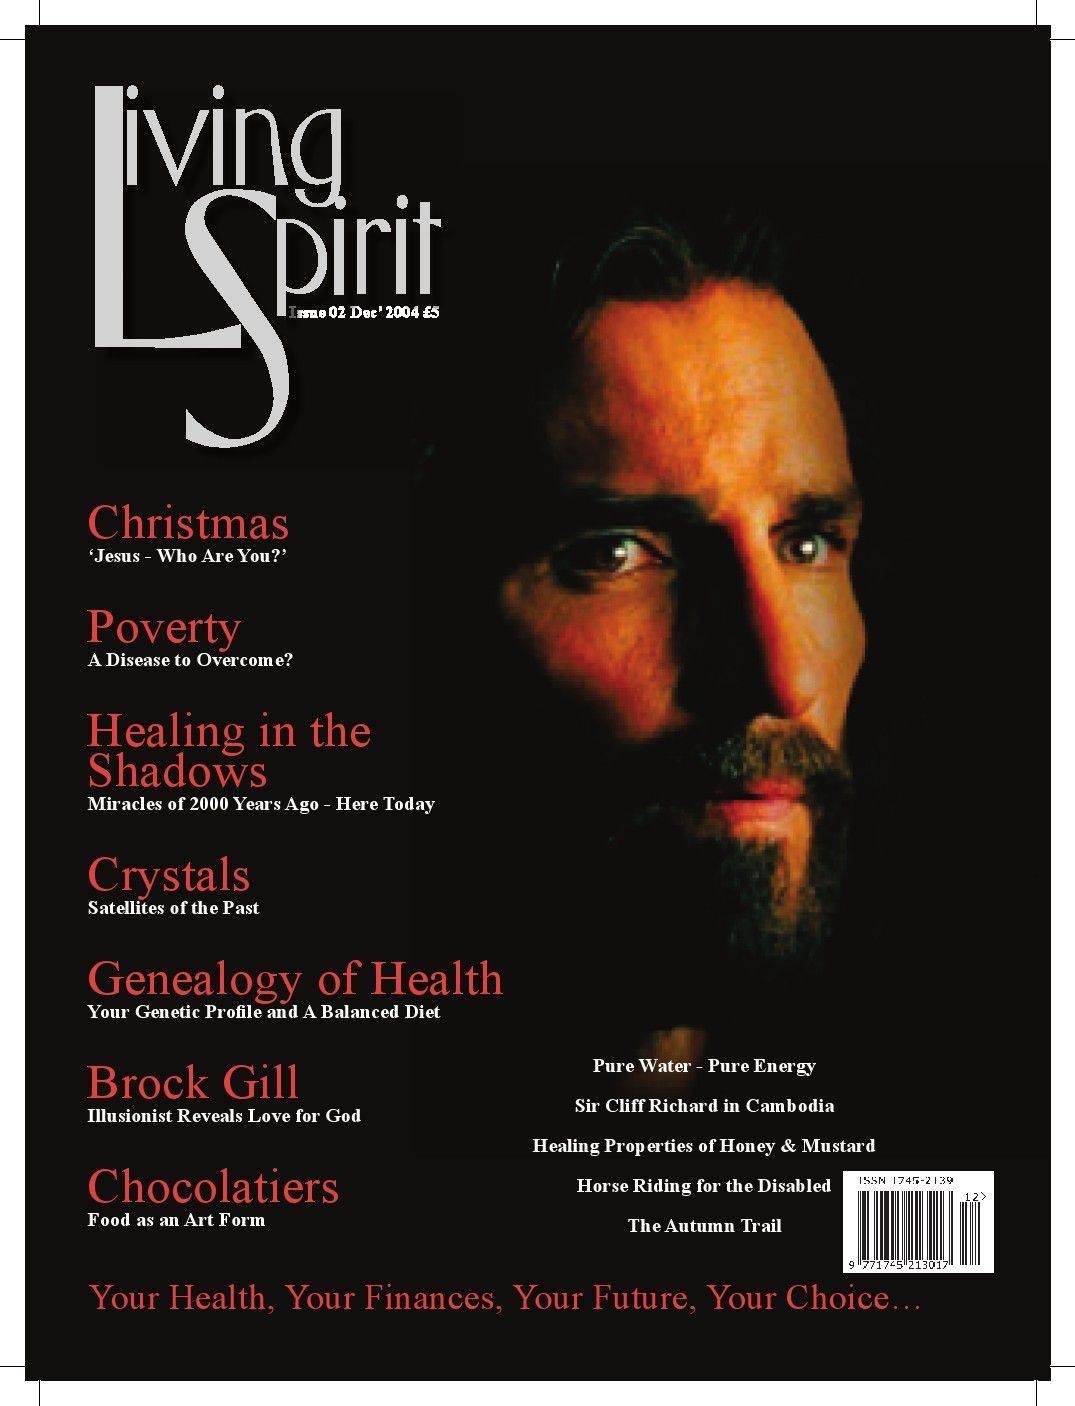 LIVING SPIRIT MAGAZINE - UK - ISSUE 2